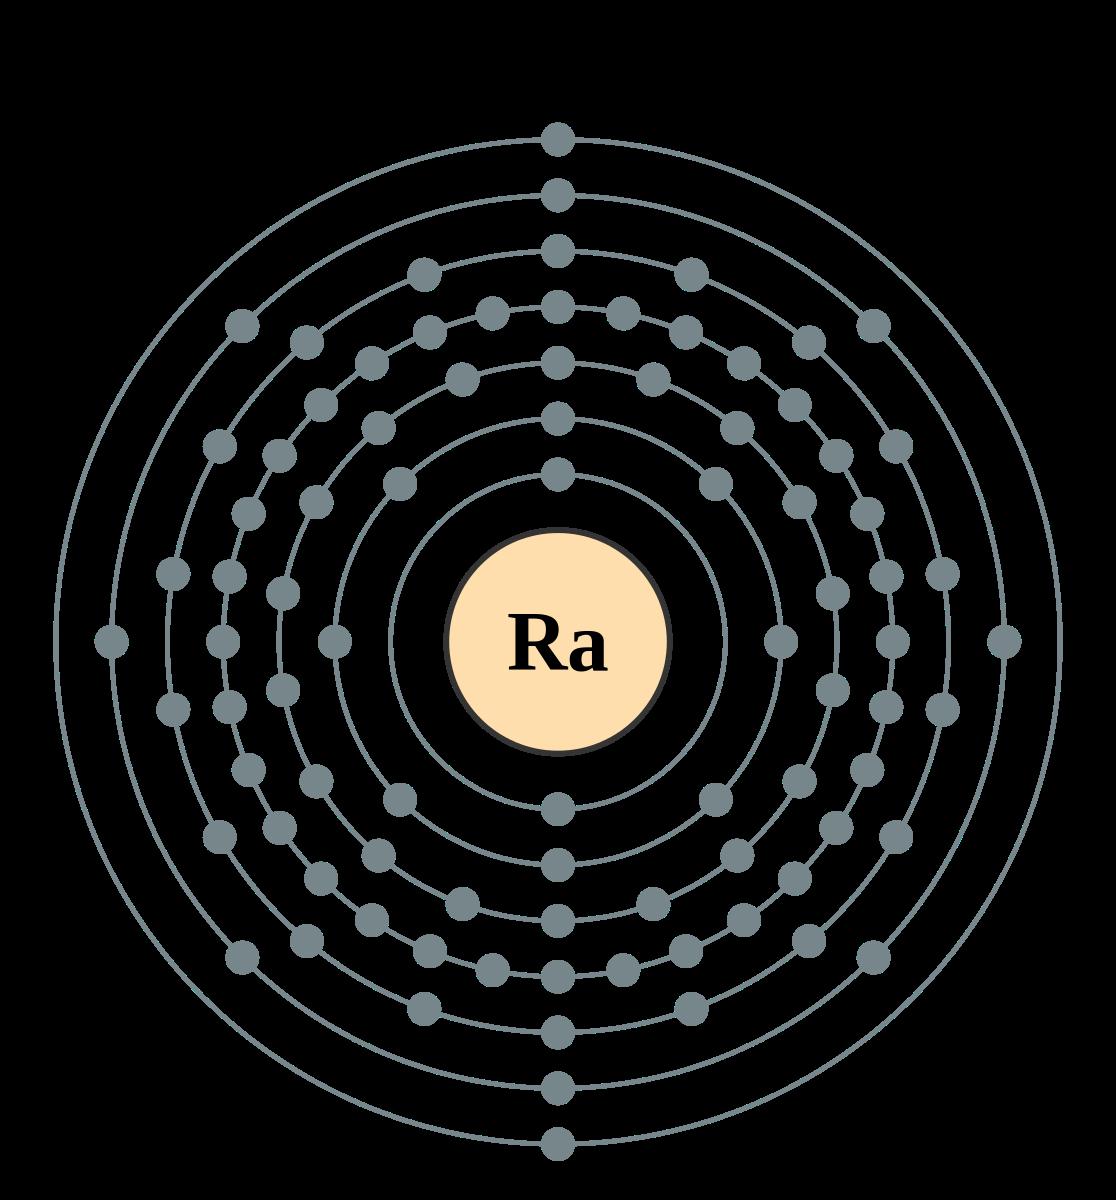 Difference Between Radon and Radium